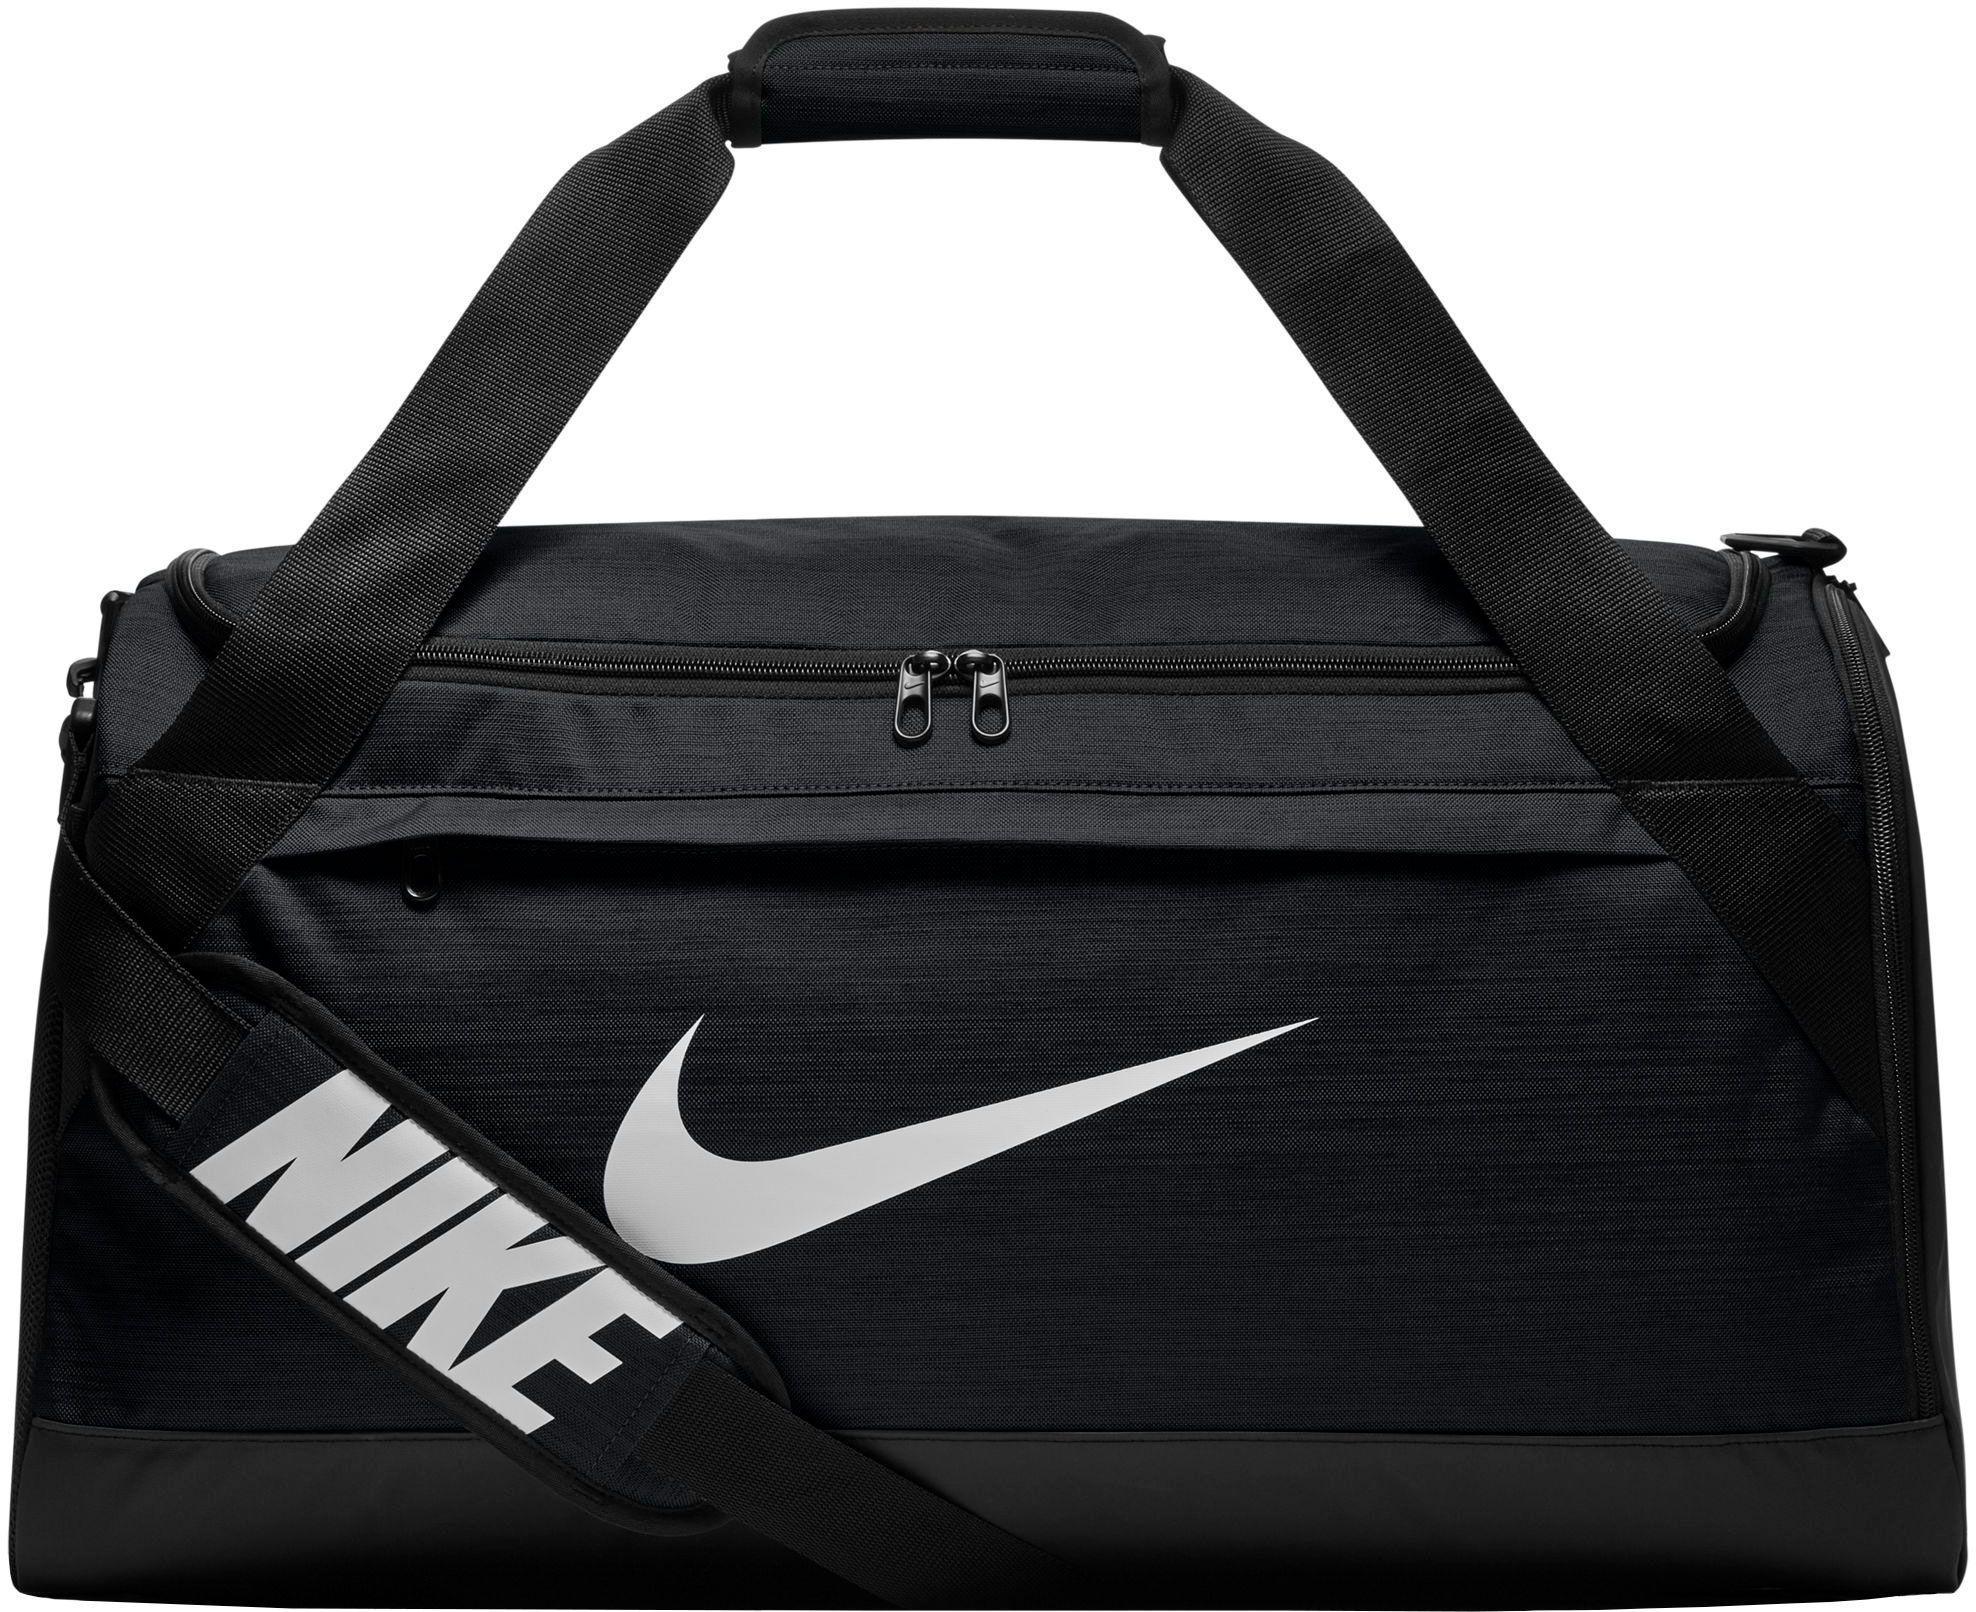 9e1982b05660 Lyst - Nike Rasilia Medium Training Duffle Bag in Black for Men